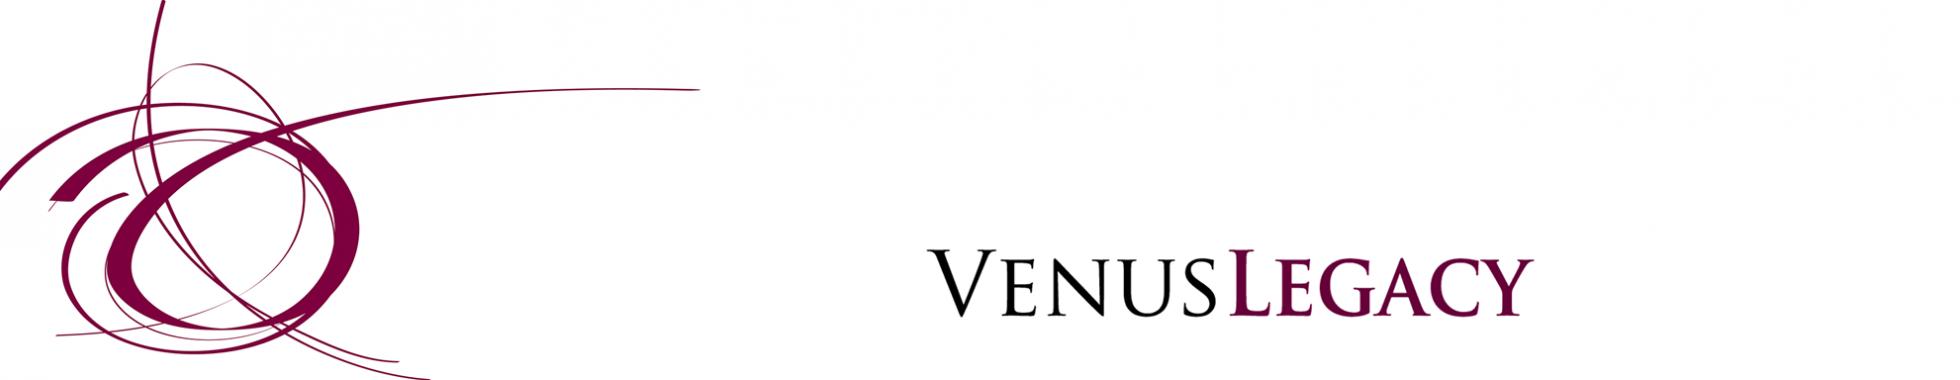 Radio fréquence Venus Legacy™ pour raffermir la peau